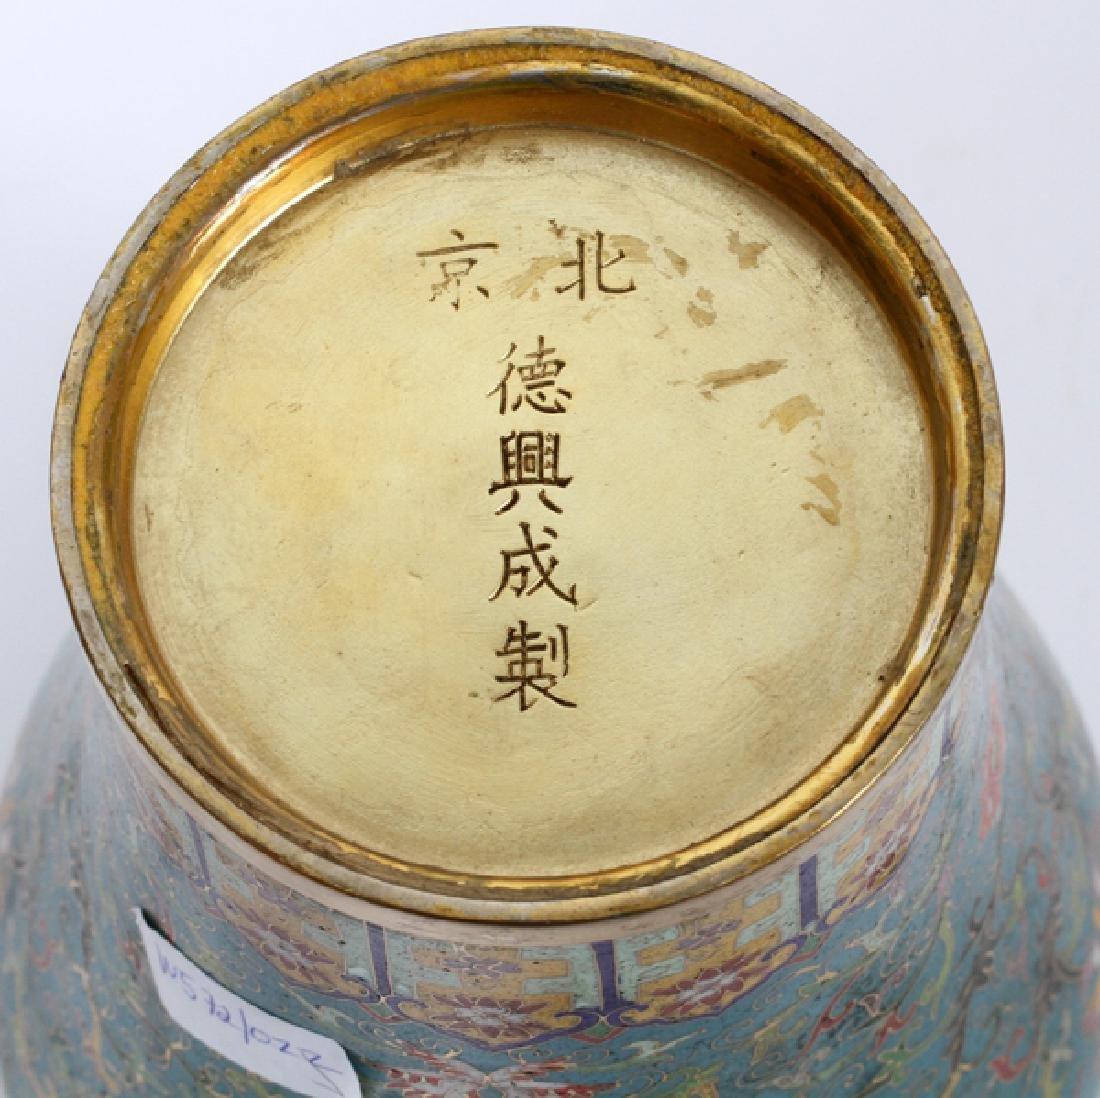 CHINESE FLORAL ON TEAL CLOISONNE VASE - 2